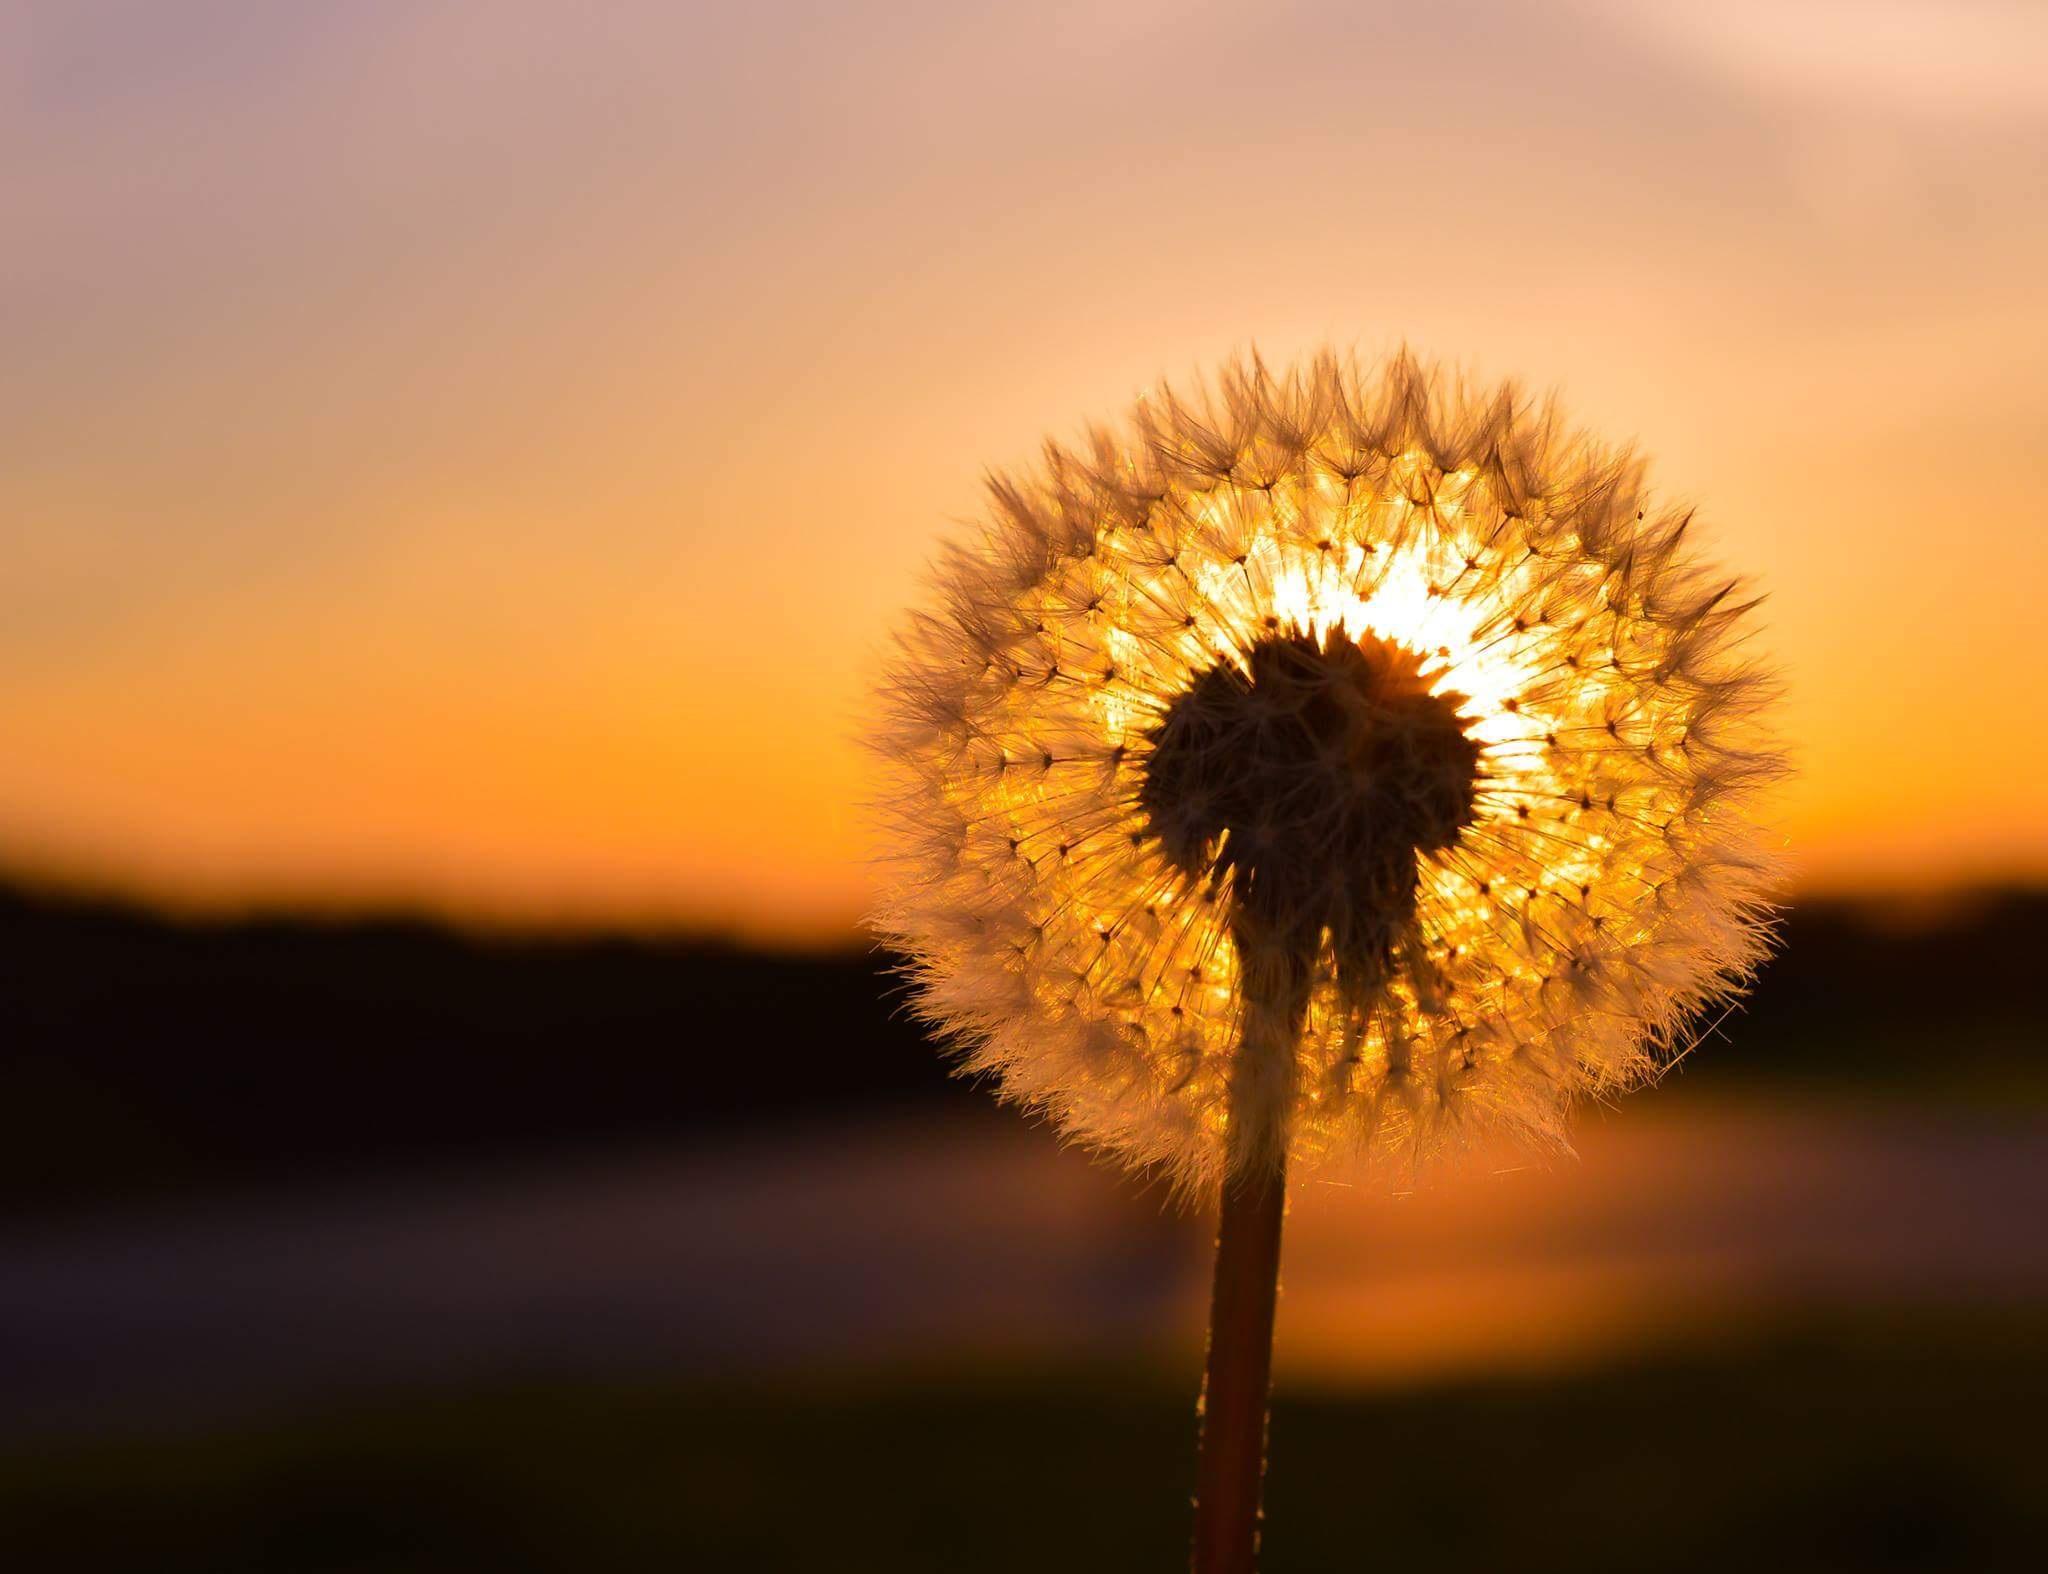 Gambar Alam Horison Bayangan Hitam Cahaya Menanam Matahari